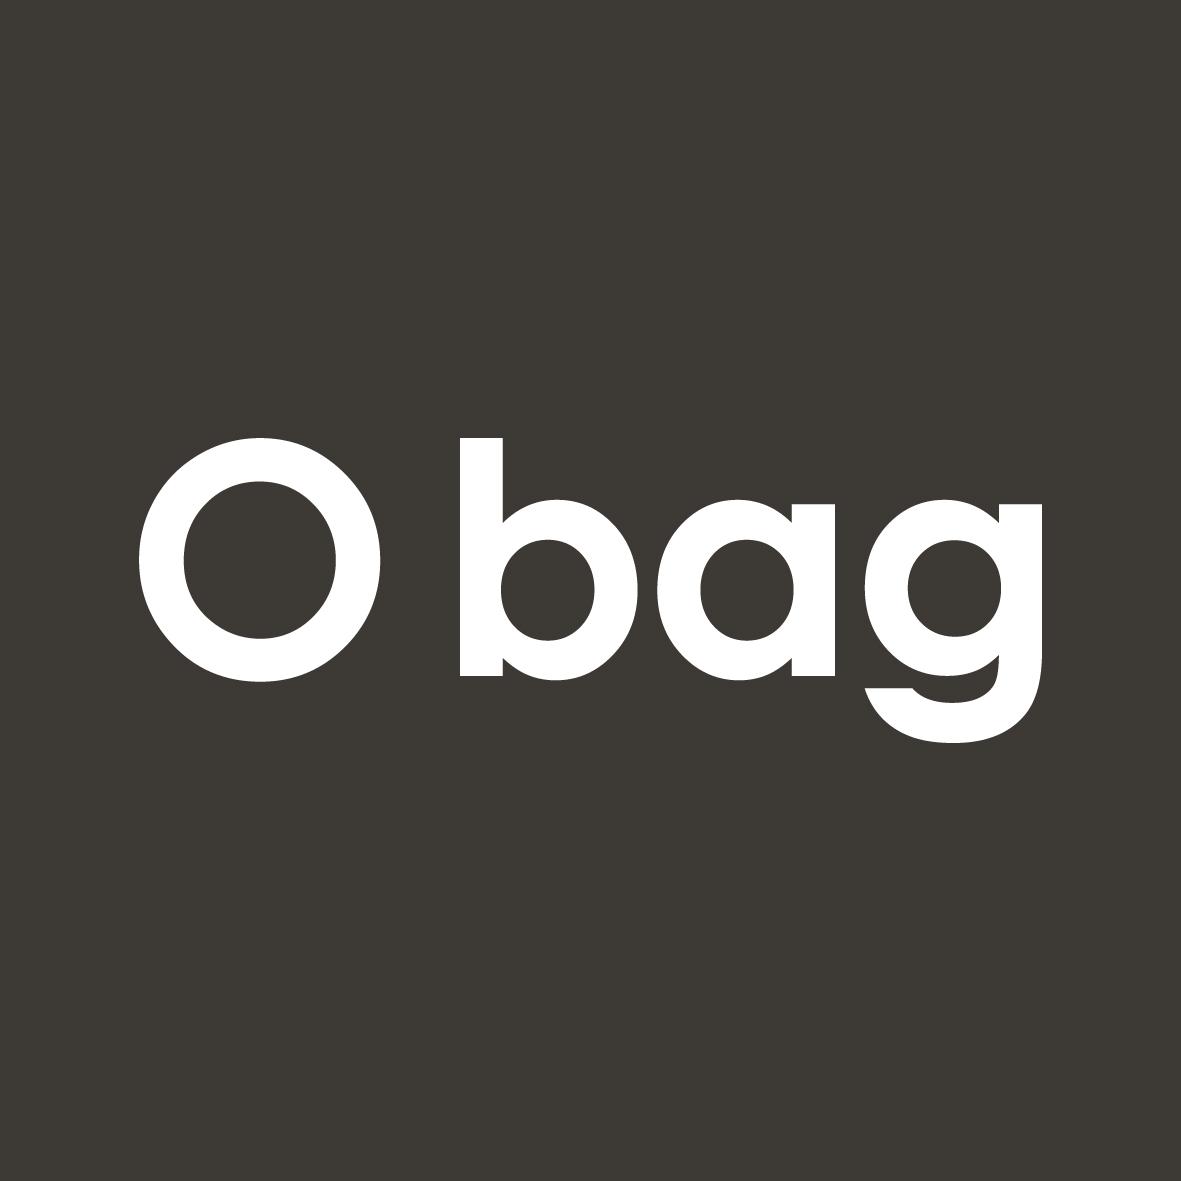 O bag - Wikipedia